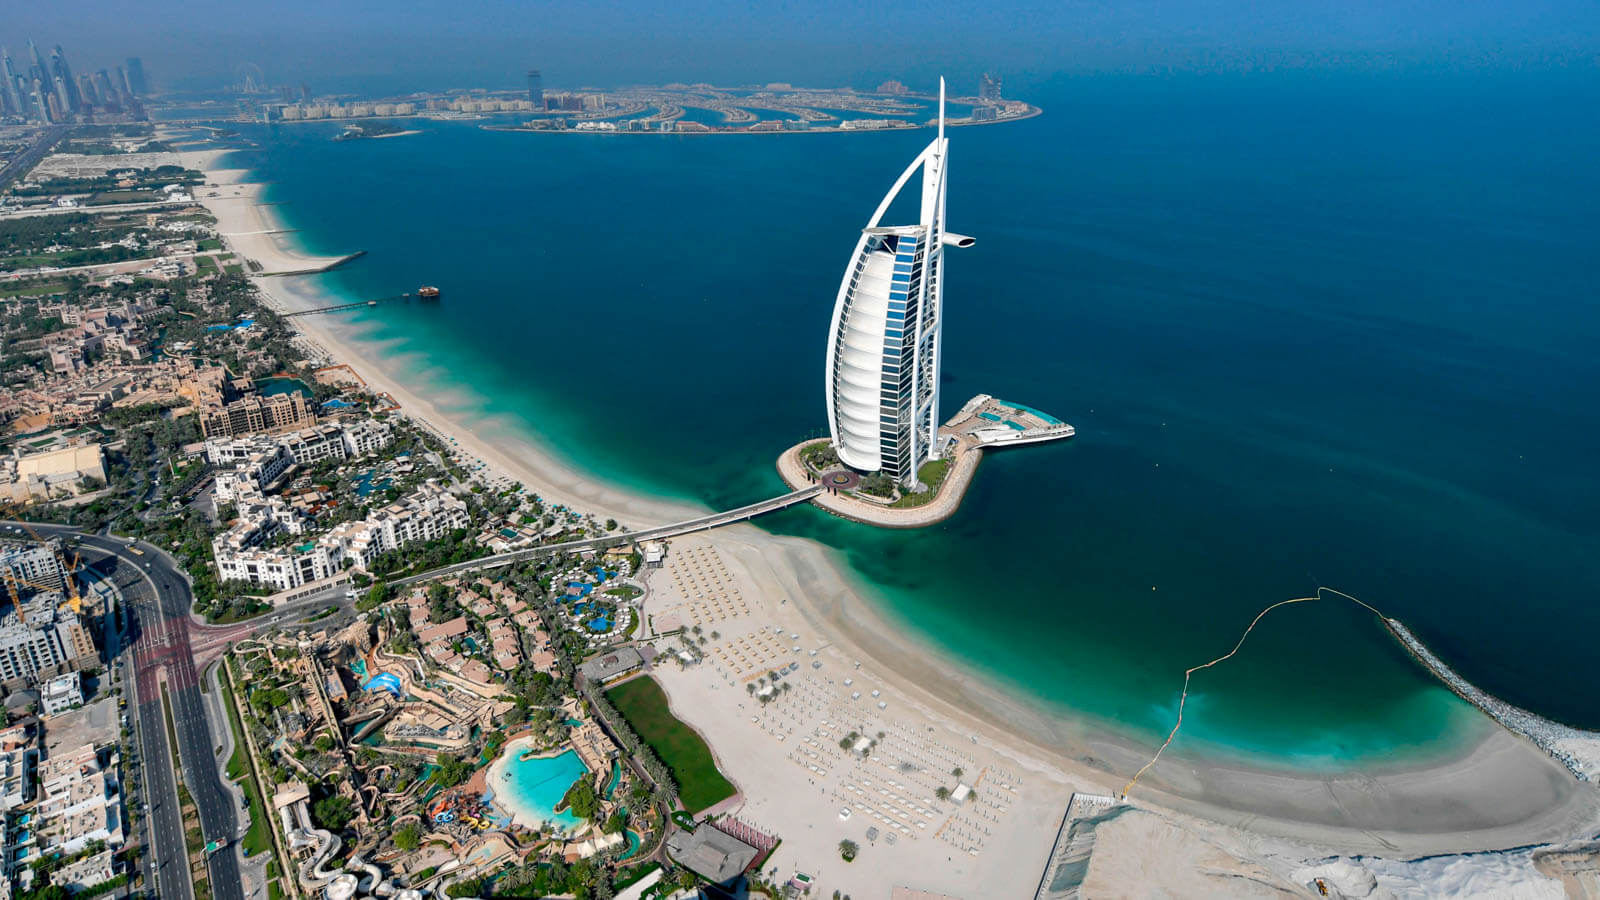 The Dubai United Arab Emirates